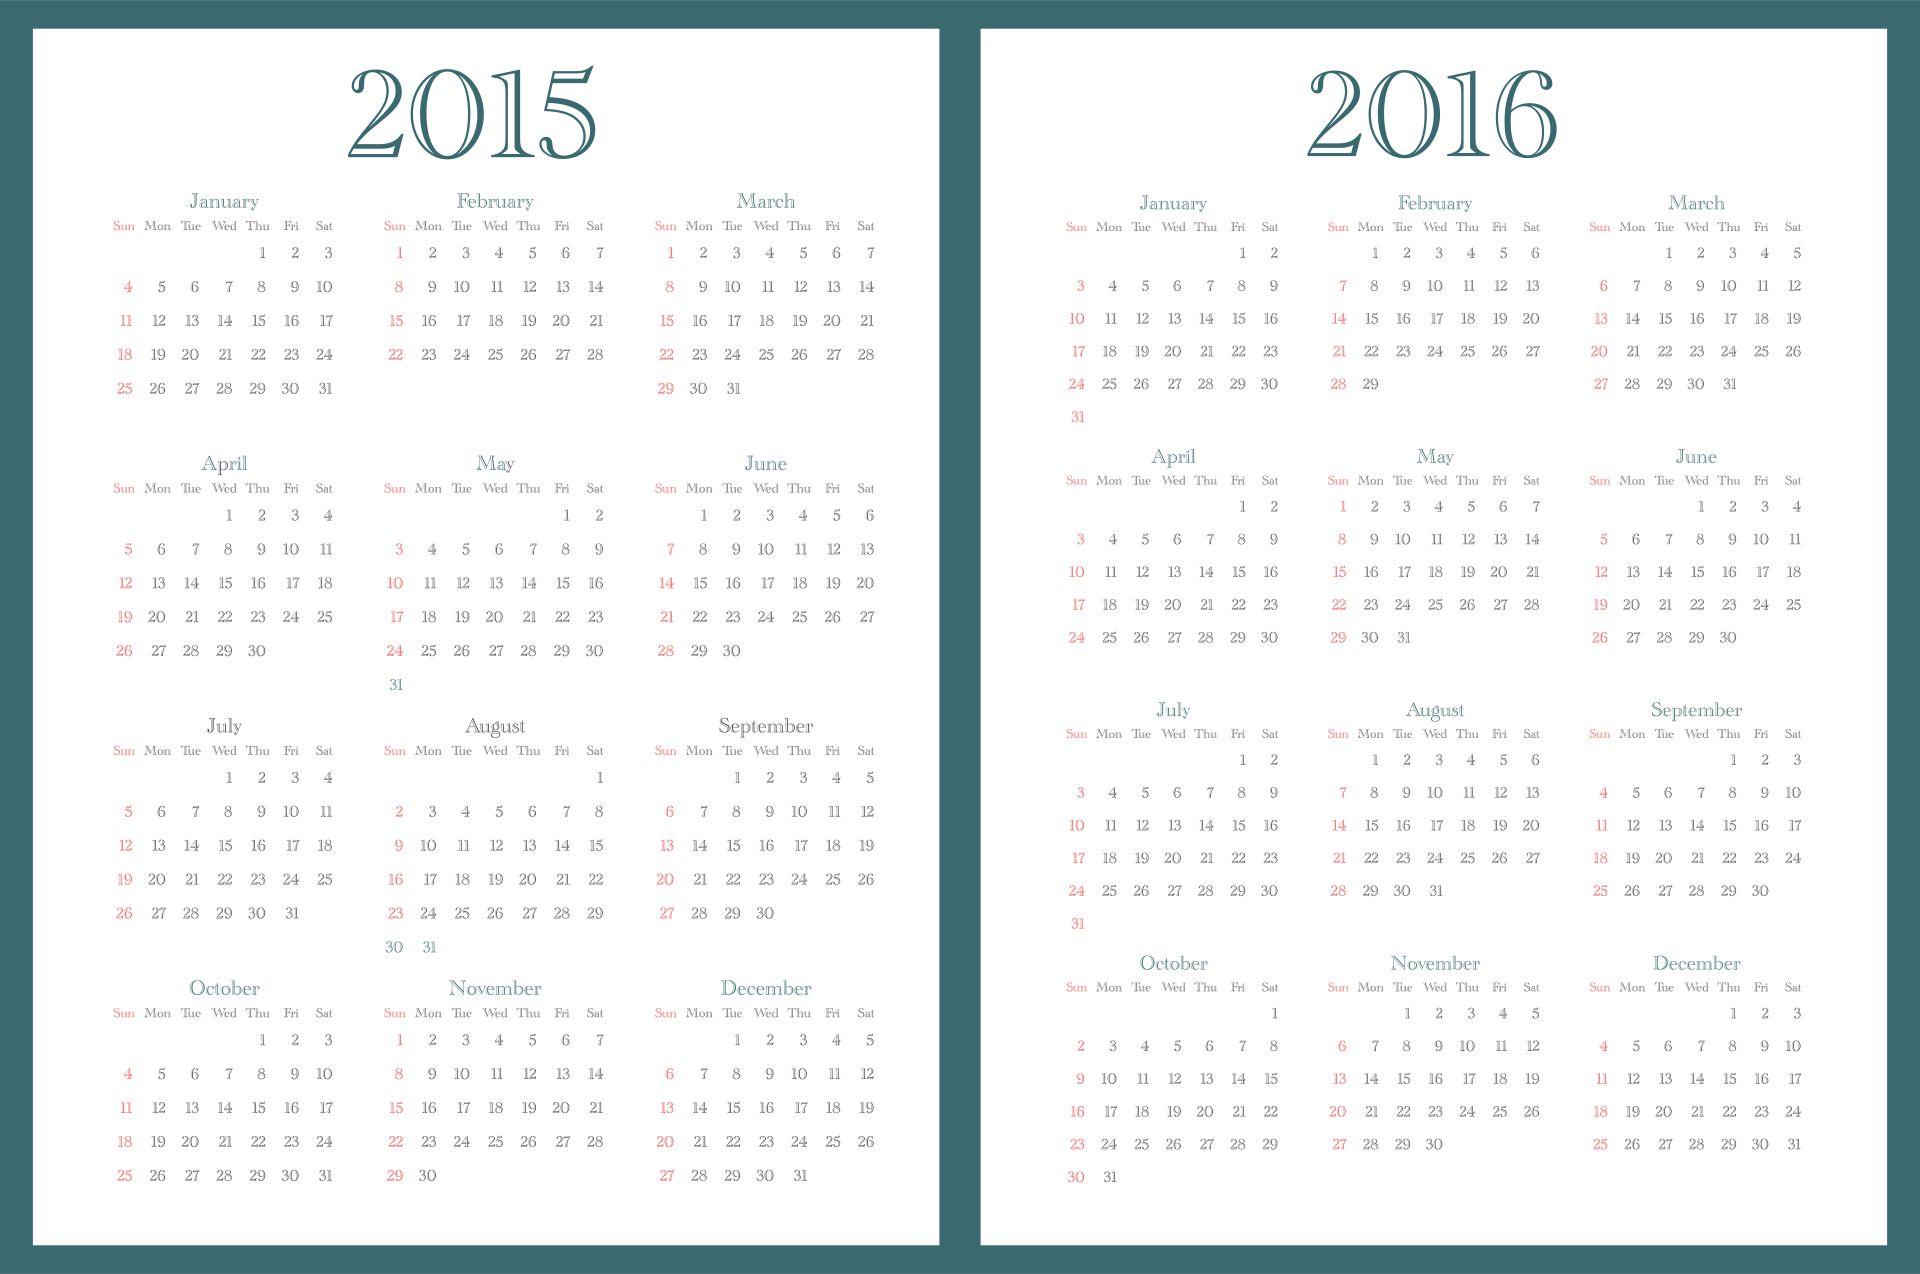 Monthly Calendar 2015 2016 Printables Planner